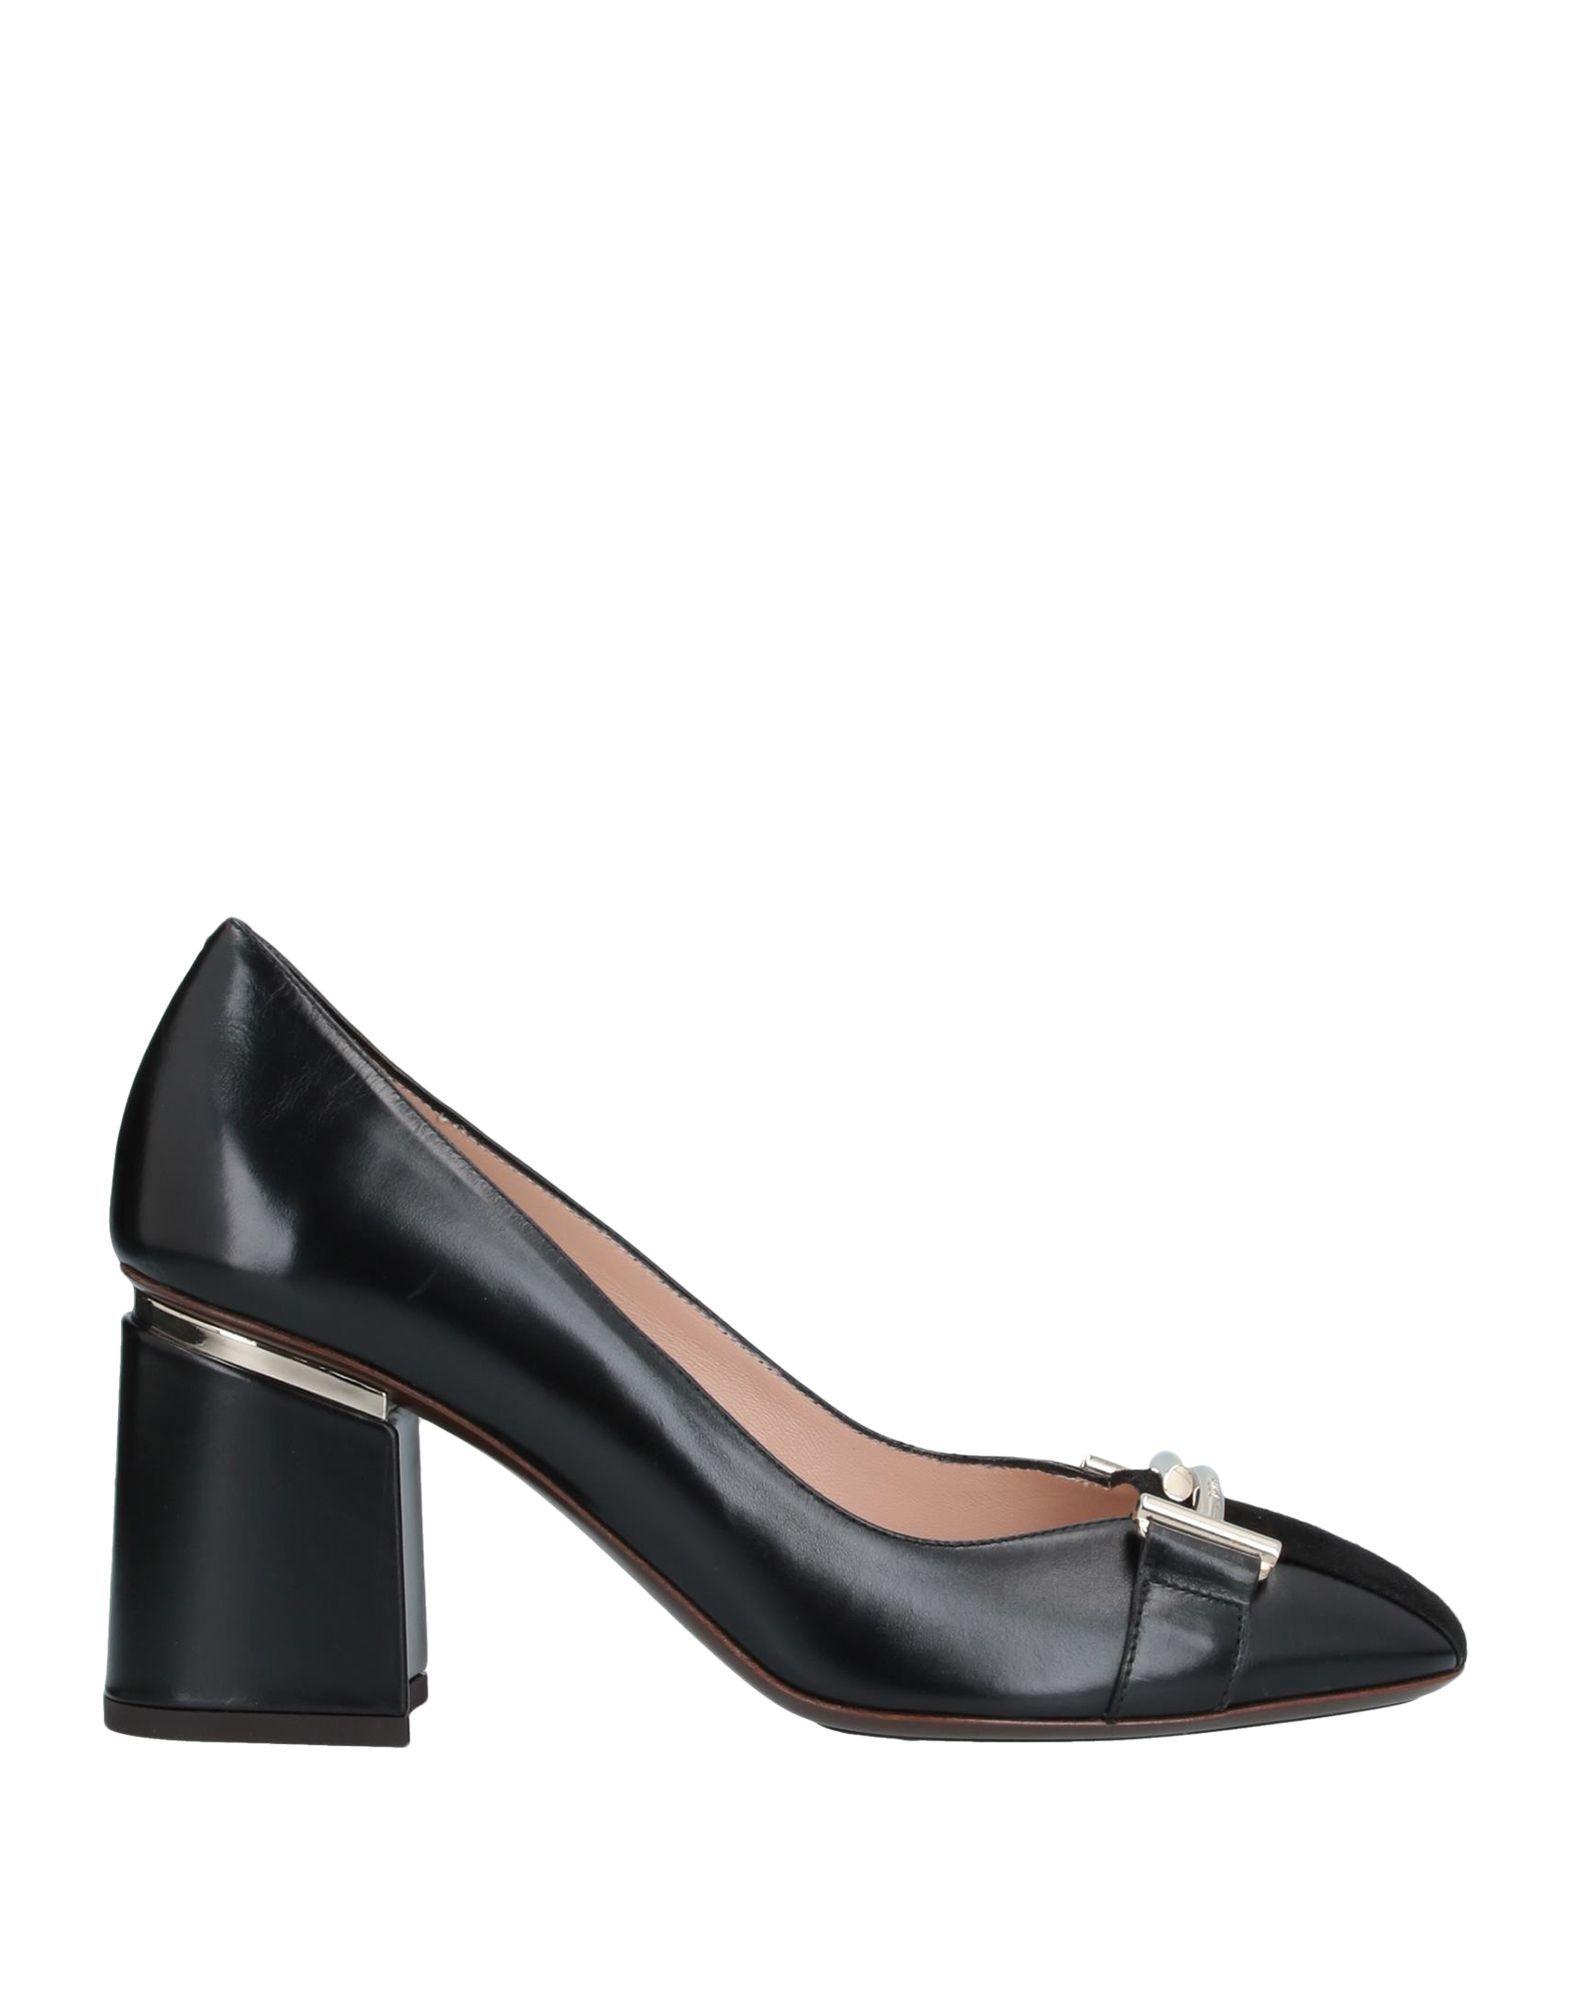 Tod's Black Leather Heels